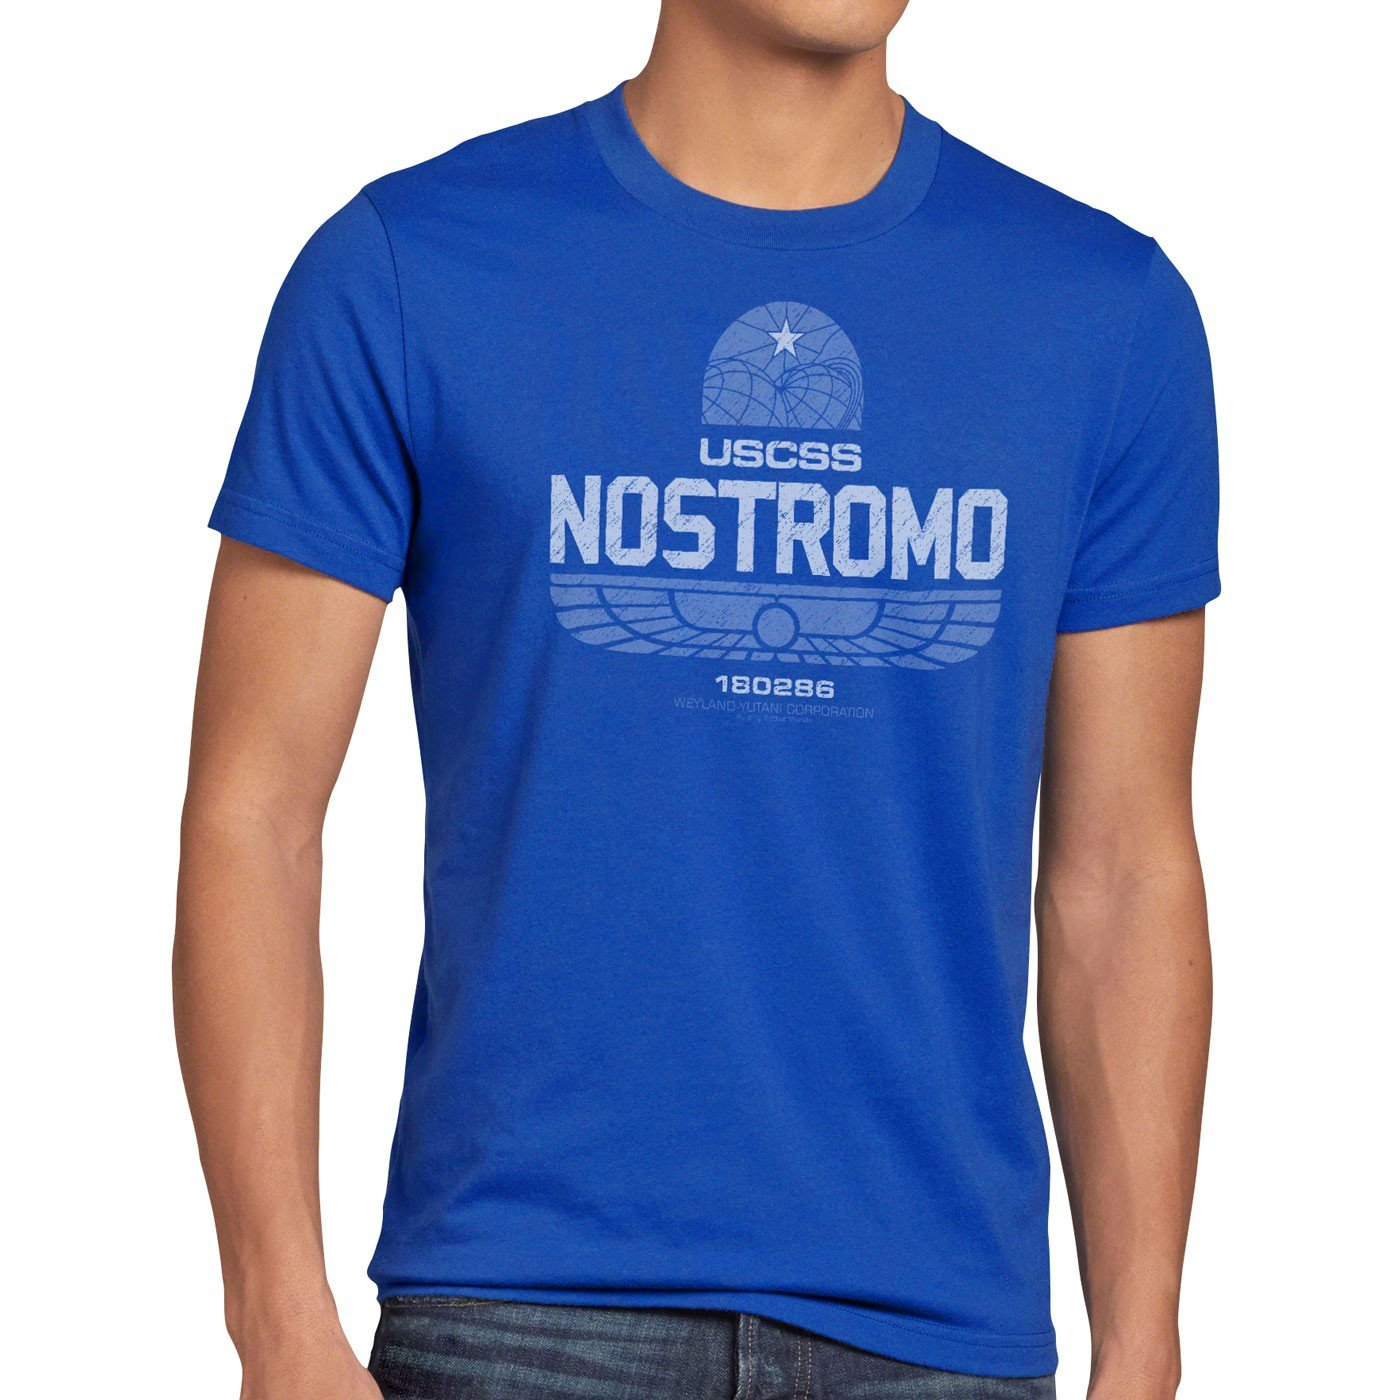 style3 USCSS Nostromo 180286 Herren T-Shirt alien xenomorph: Amazon.de:  Bekleidung